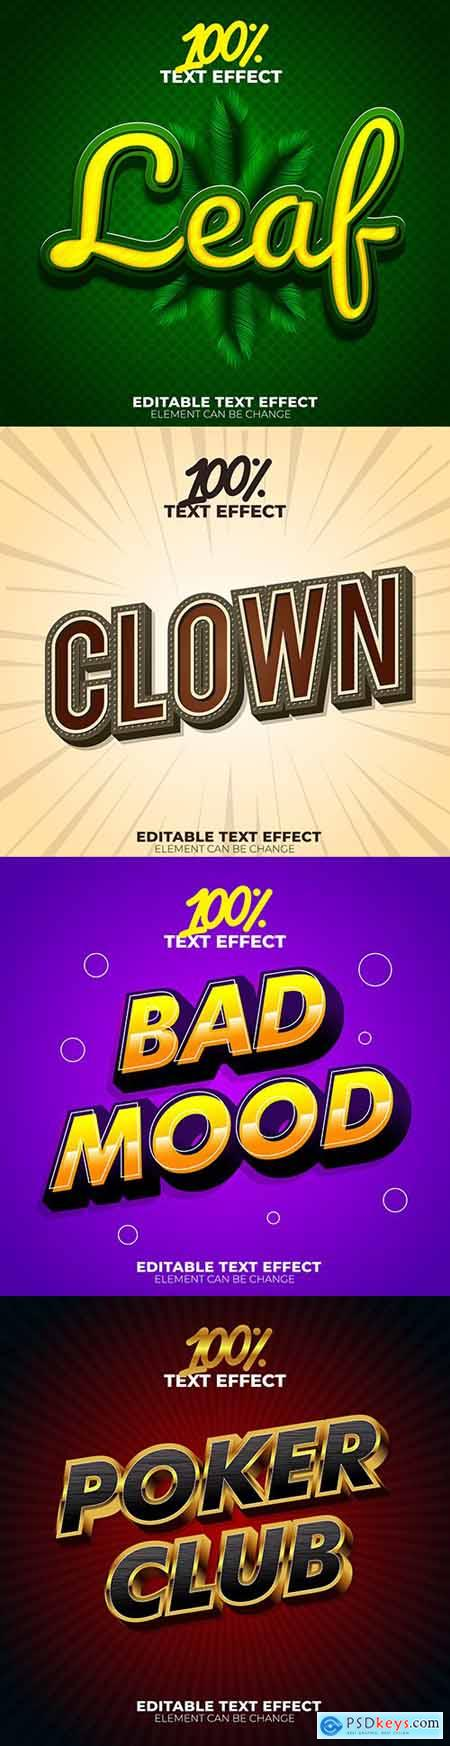 Editable font effect text collection illustration design 43